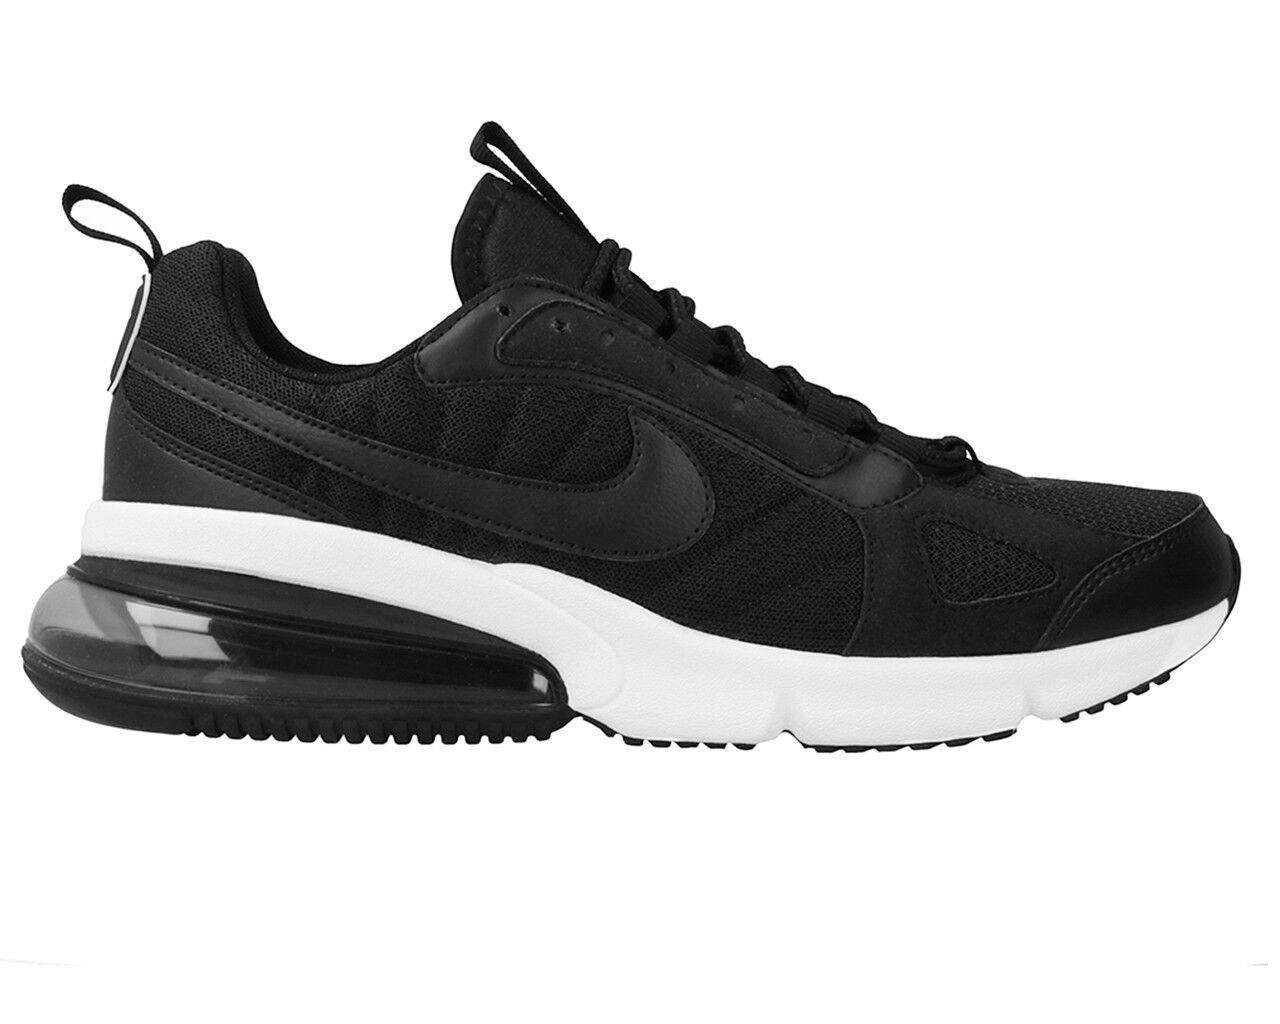 Nike Air Max 270 Futura AO1569 001 Baskets Homme Noir Blanc Femme Chaussures De Sport